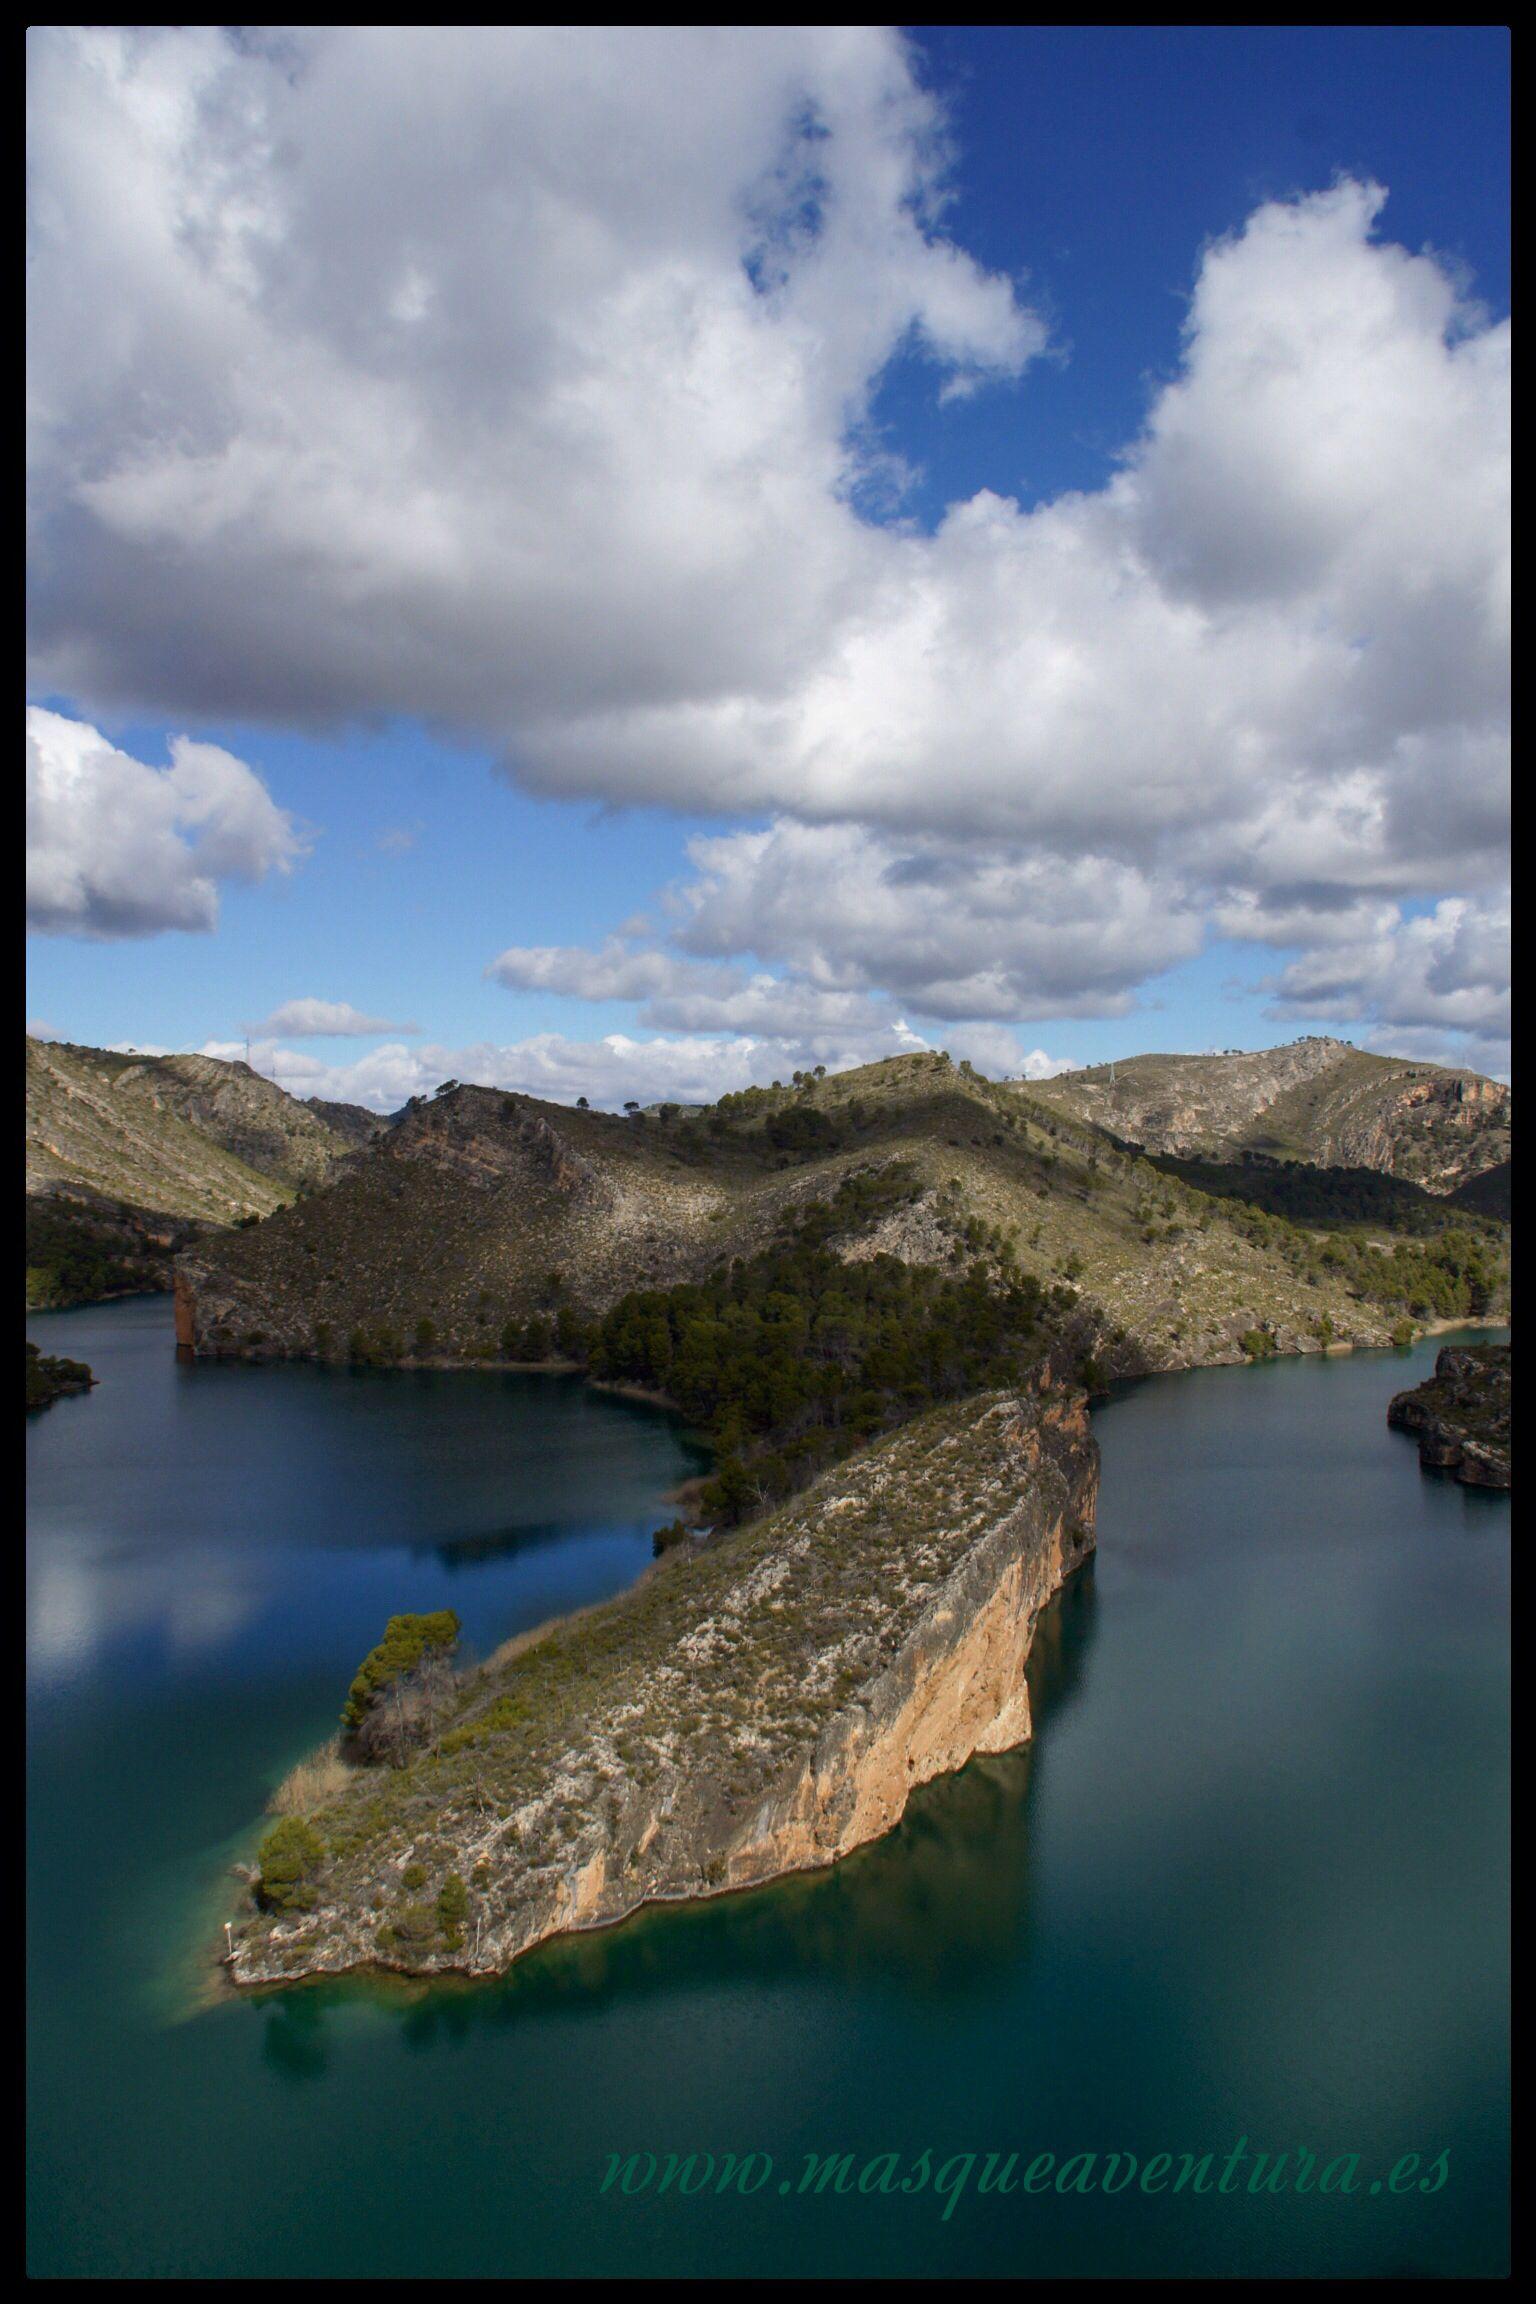 Masqueaventura,lago de BOLARQUE,almonacid de Zorita